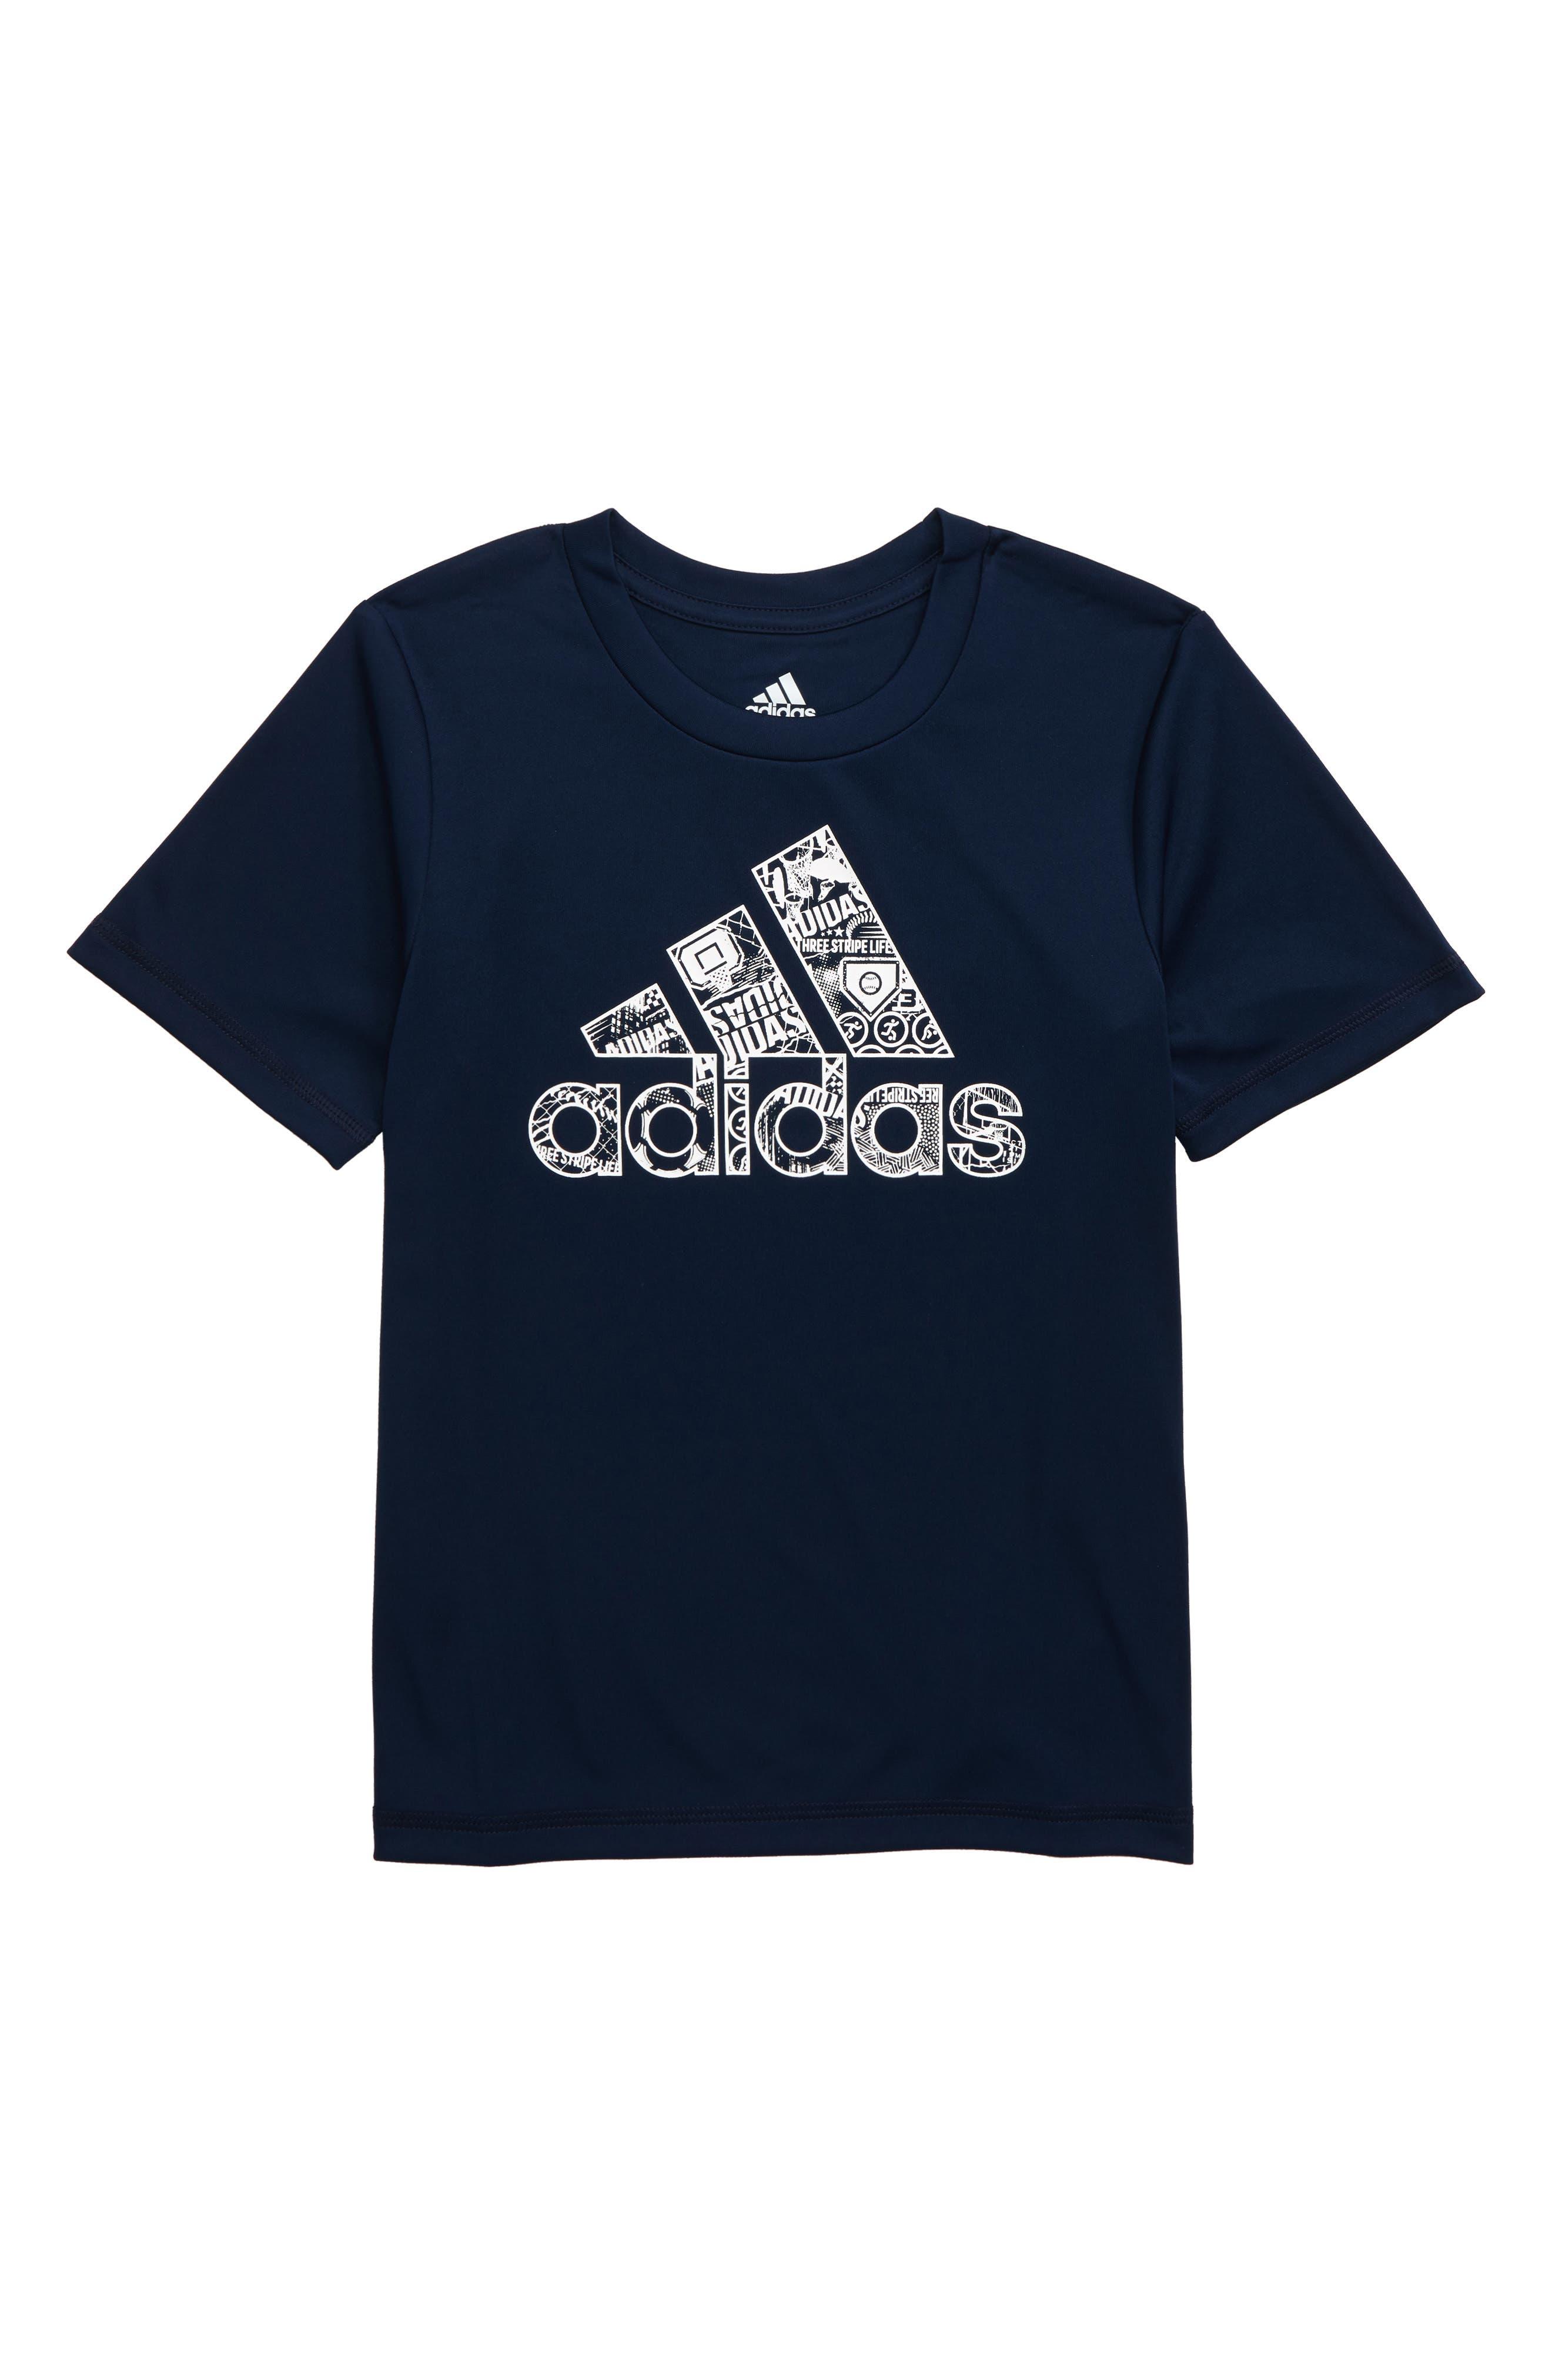 ADIDAS, Multi Sport T-Shirt, Main thumbnail 1, color, NAVY